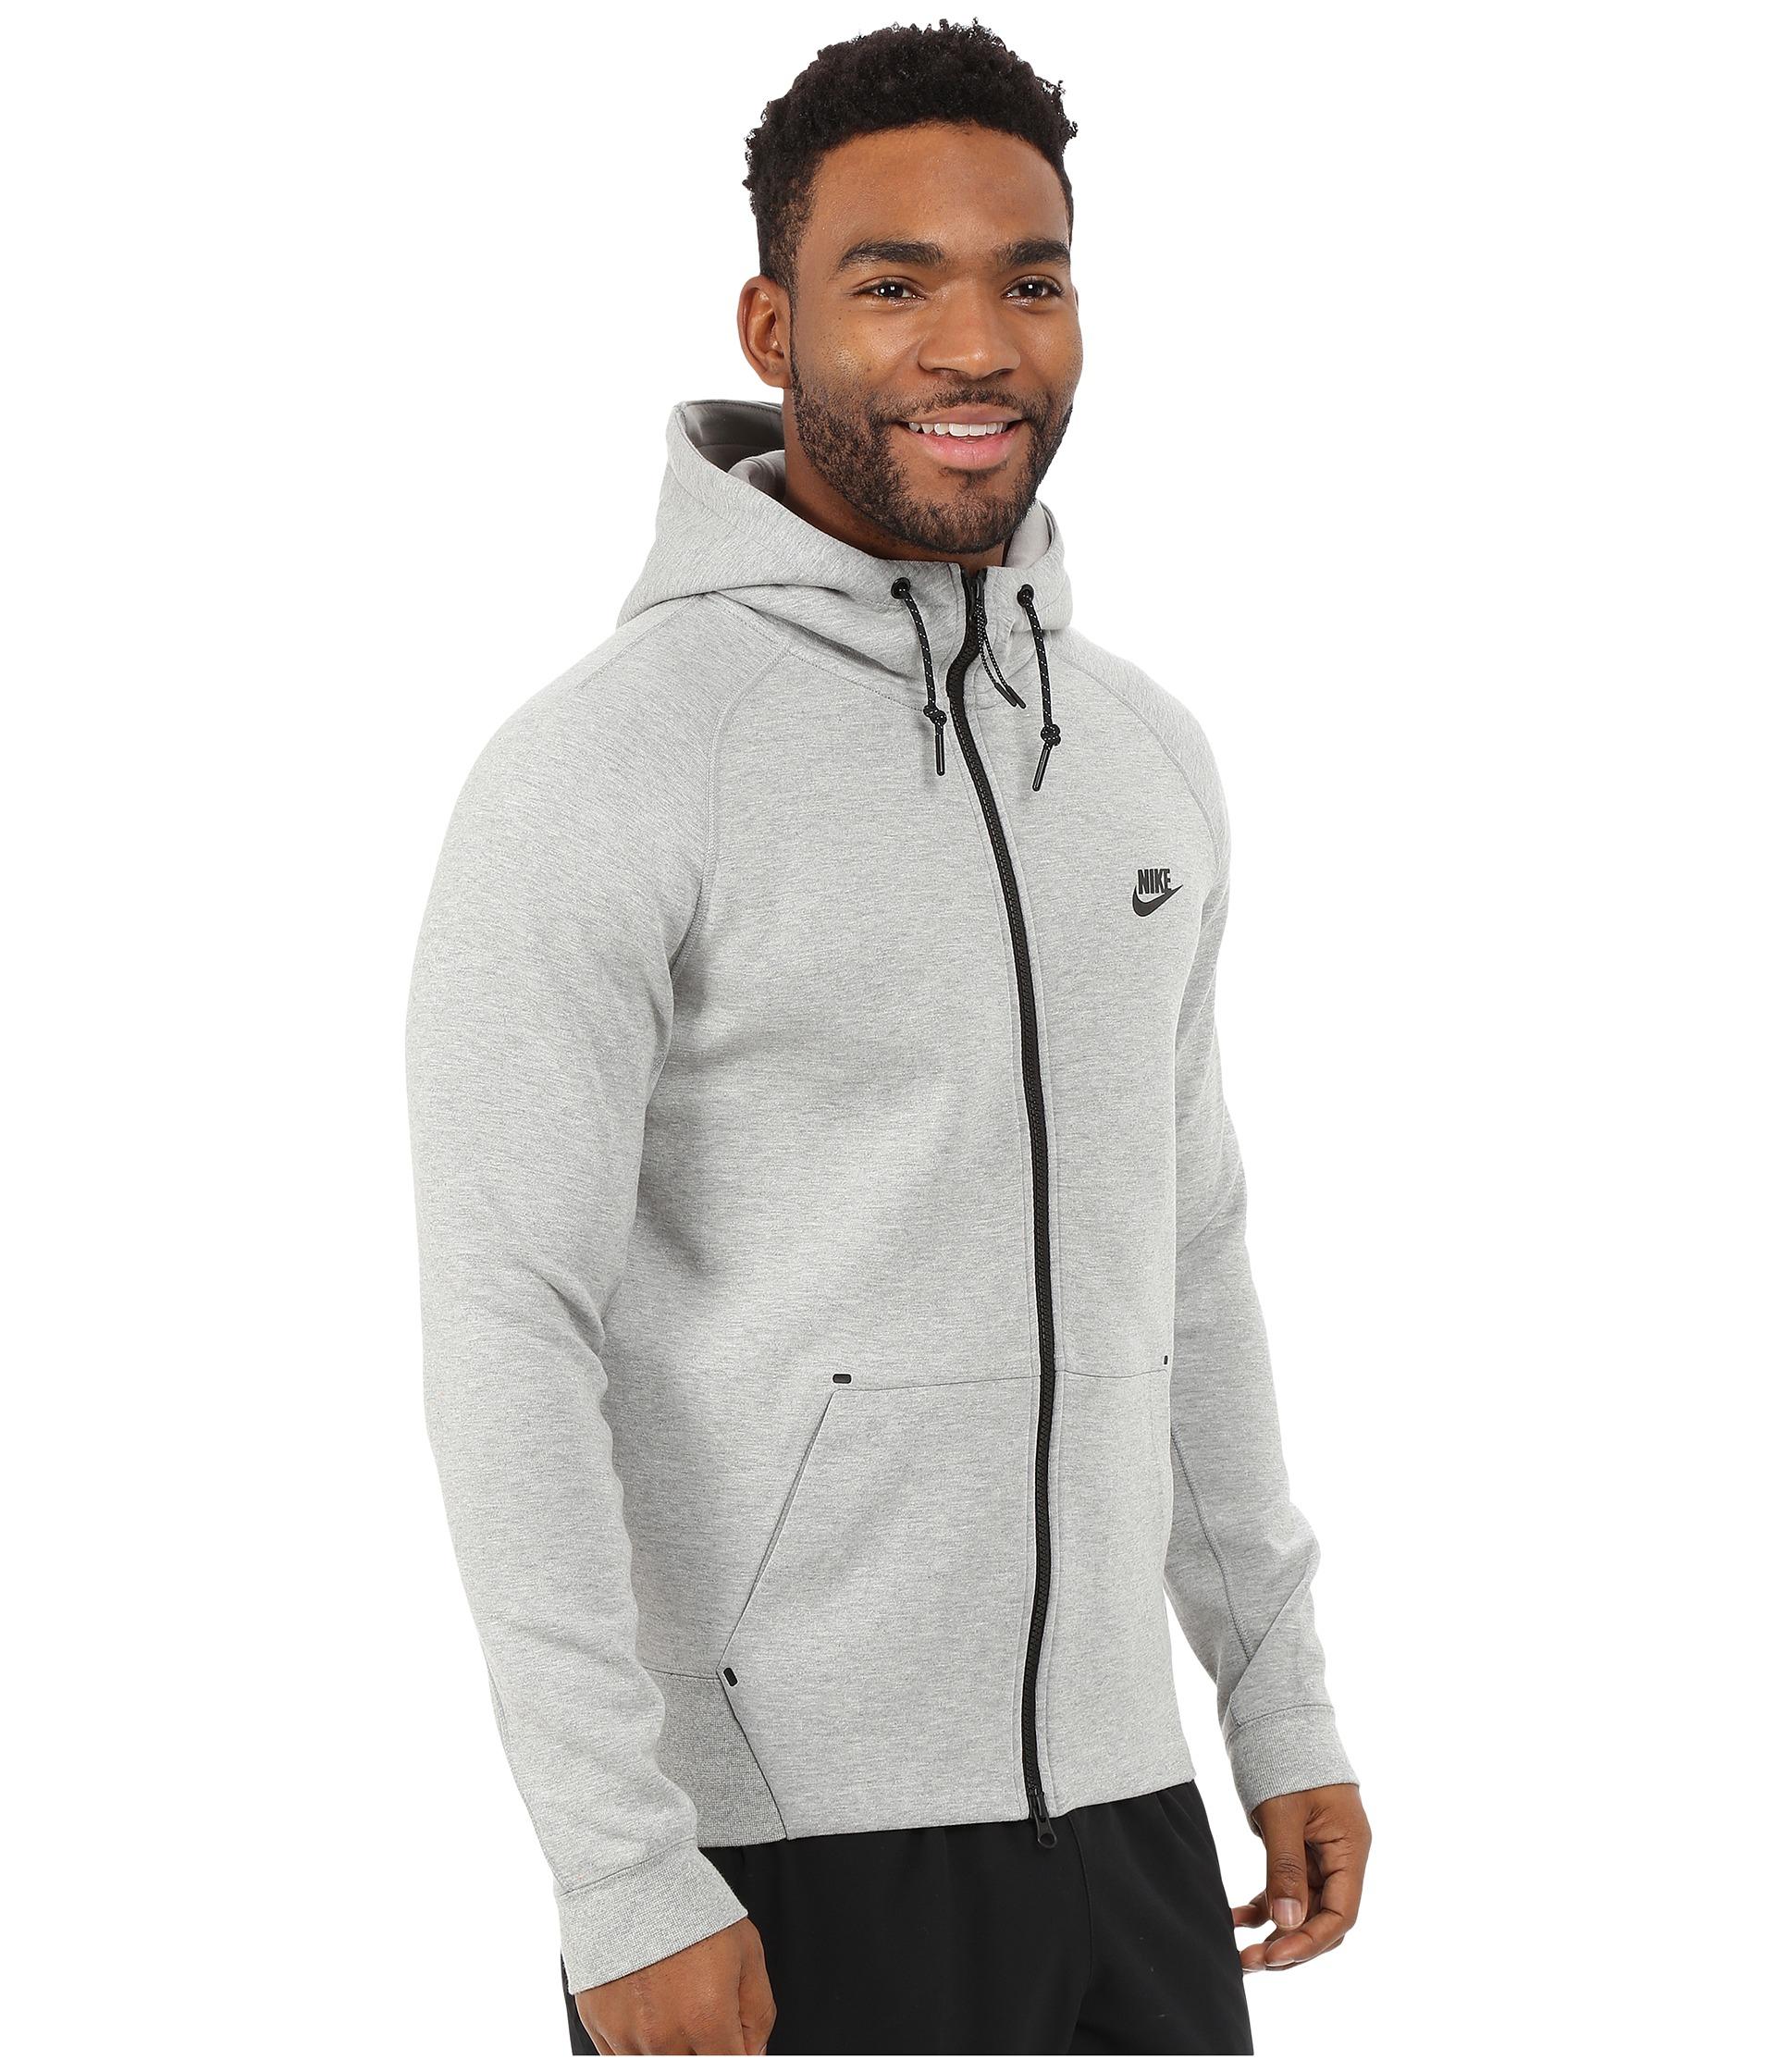 389c0e90d2b Lyst - Nike Tech Fleece Aw77 1.0 Full-zip Hoodie in Gray for Men